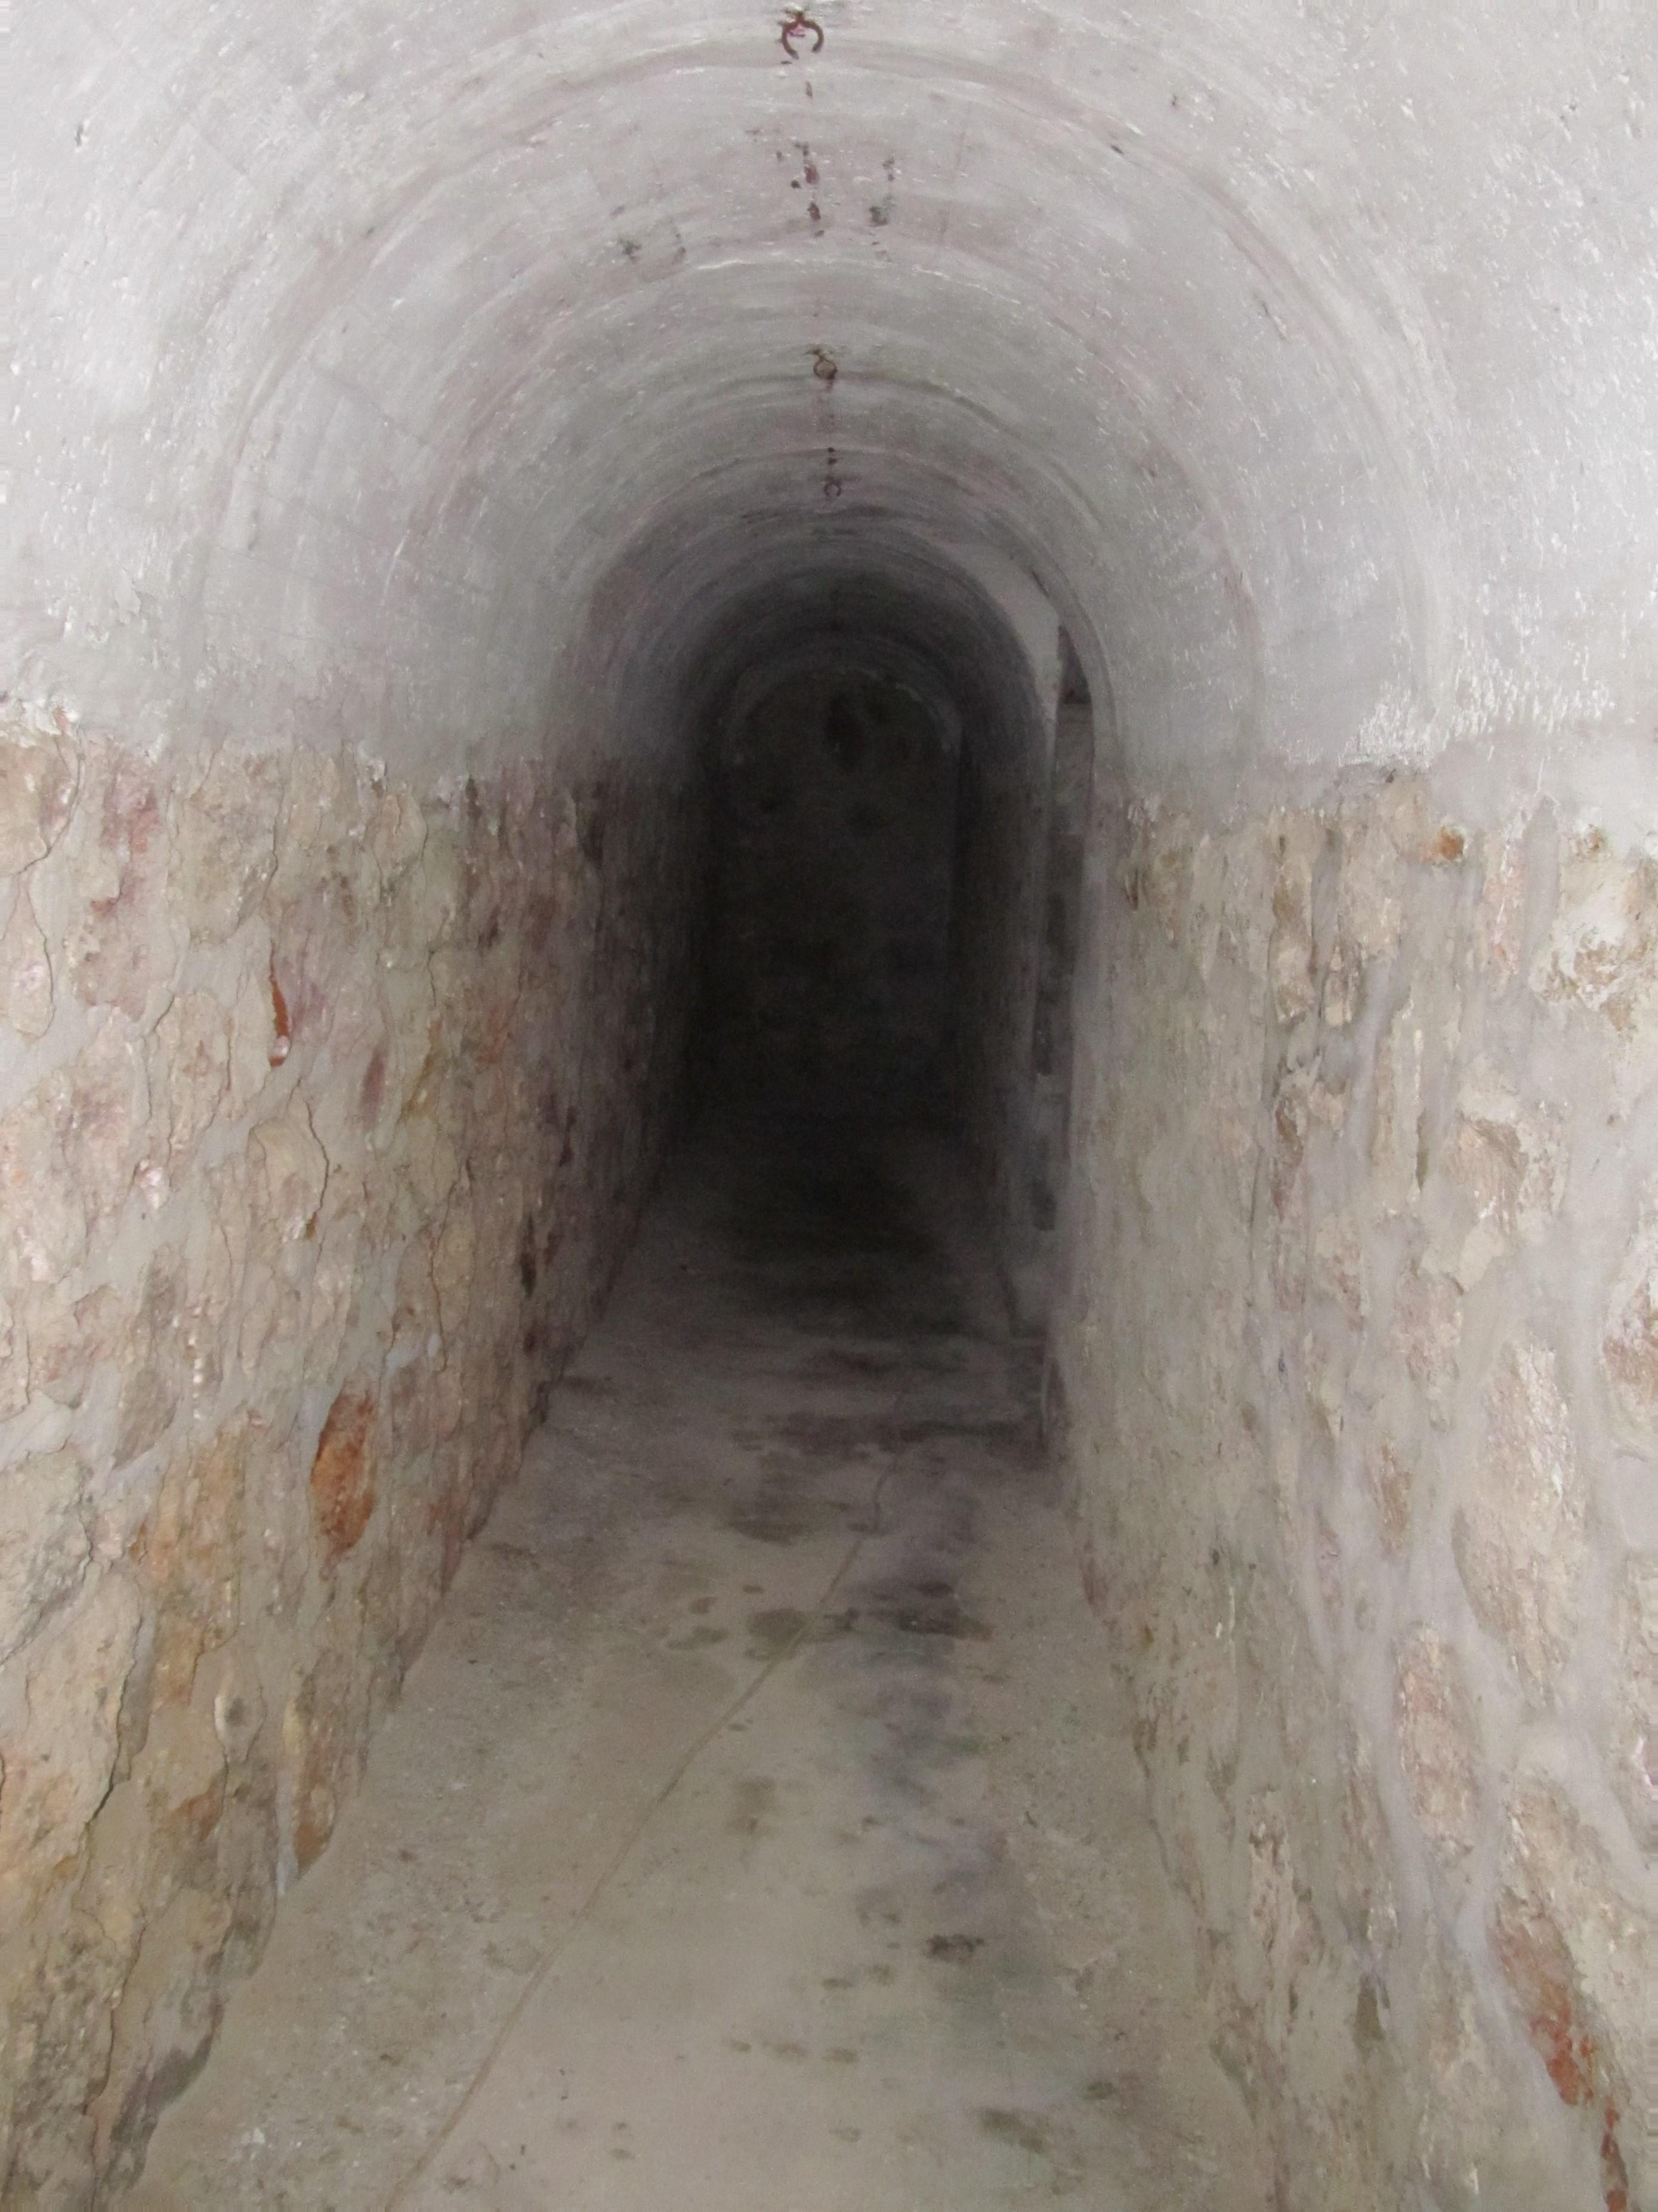 An internal corridor.